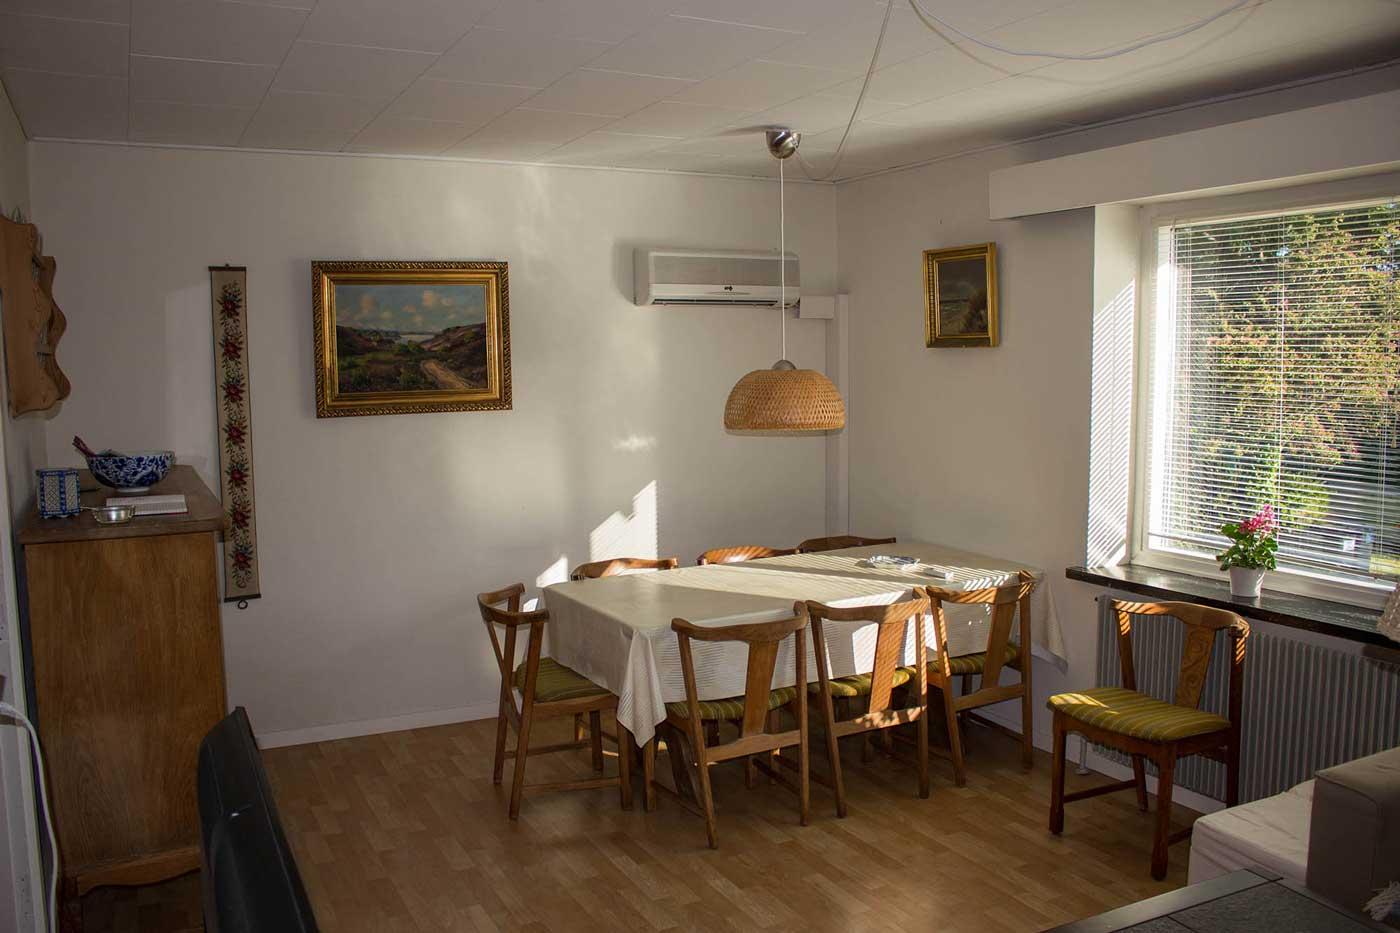 Spisepladser i stuen i stueetagen med Solen i de store vinduer